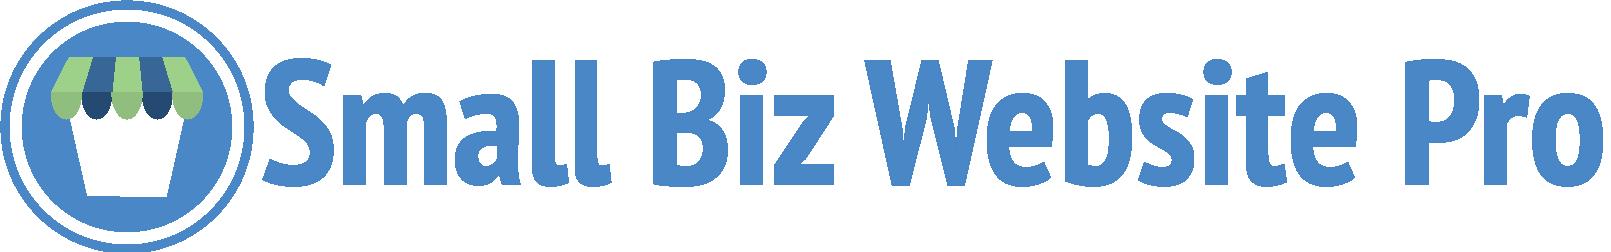 Small Biz Websites